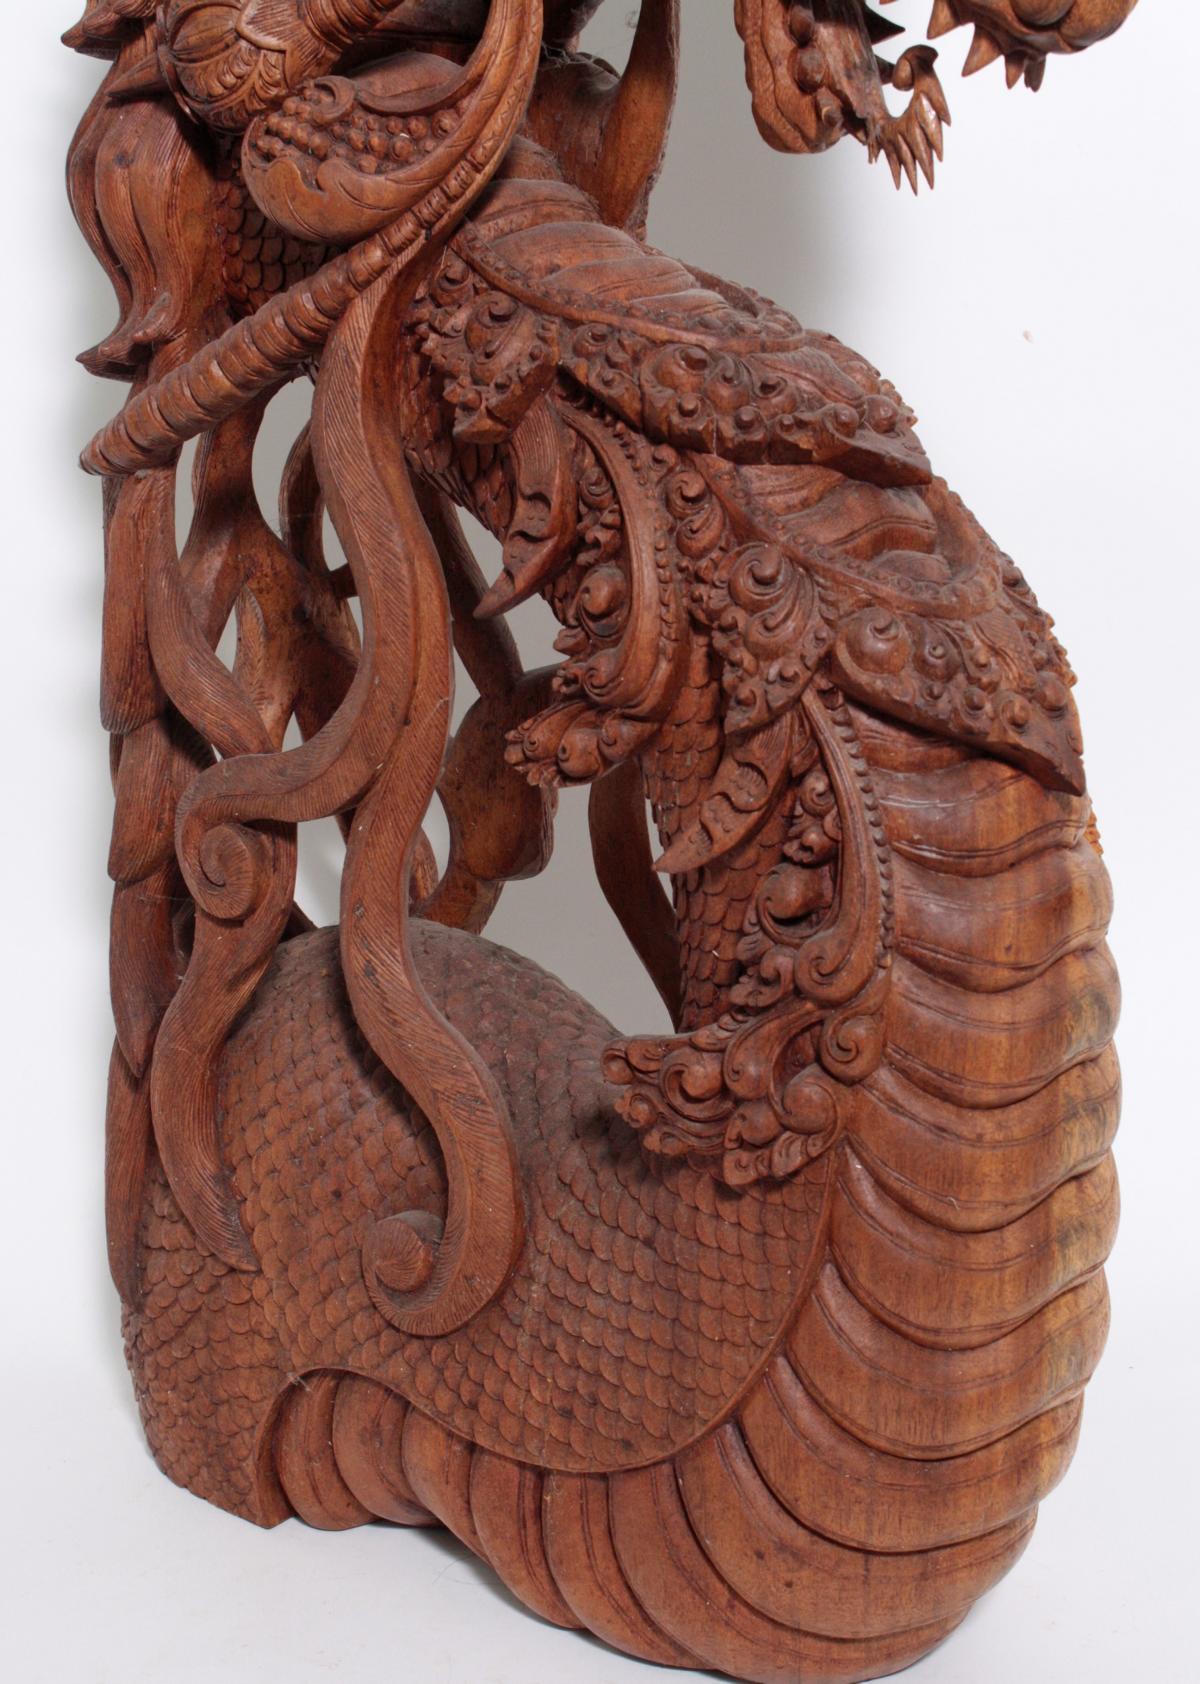 Große Holzskulptur, Drache, Indonesien, 2. Hälfte 20. Jahrhundert-6